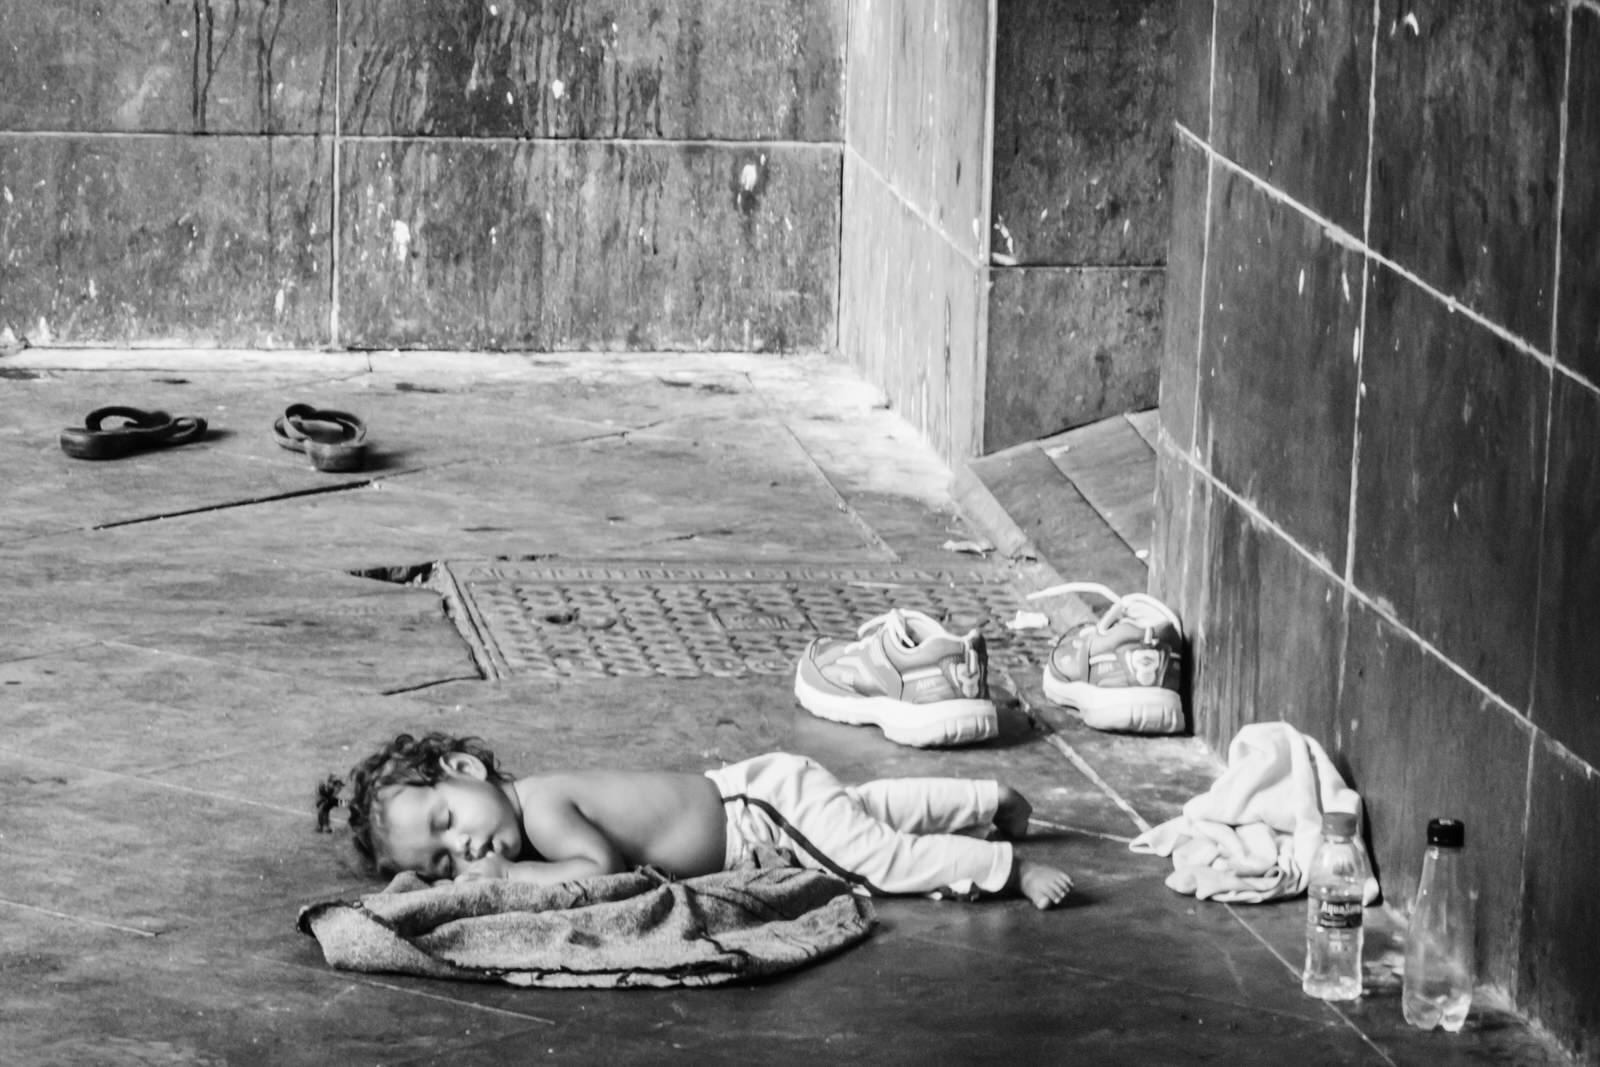 India2016-KathleenHertelPhotography-3.jpg